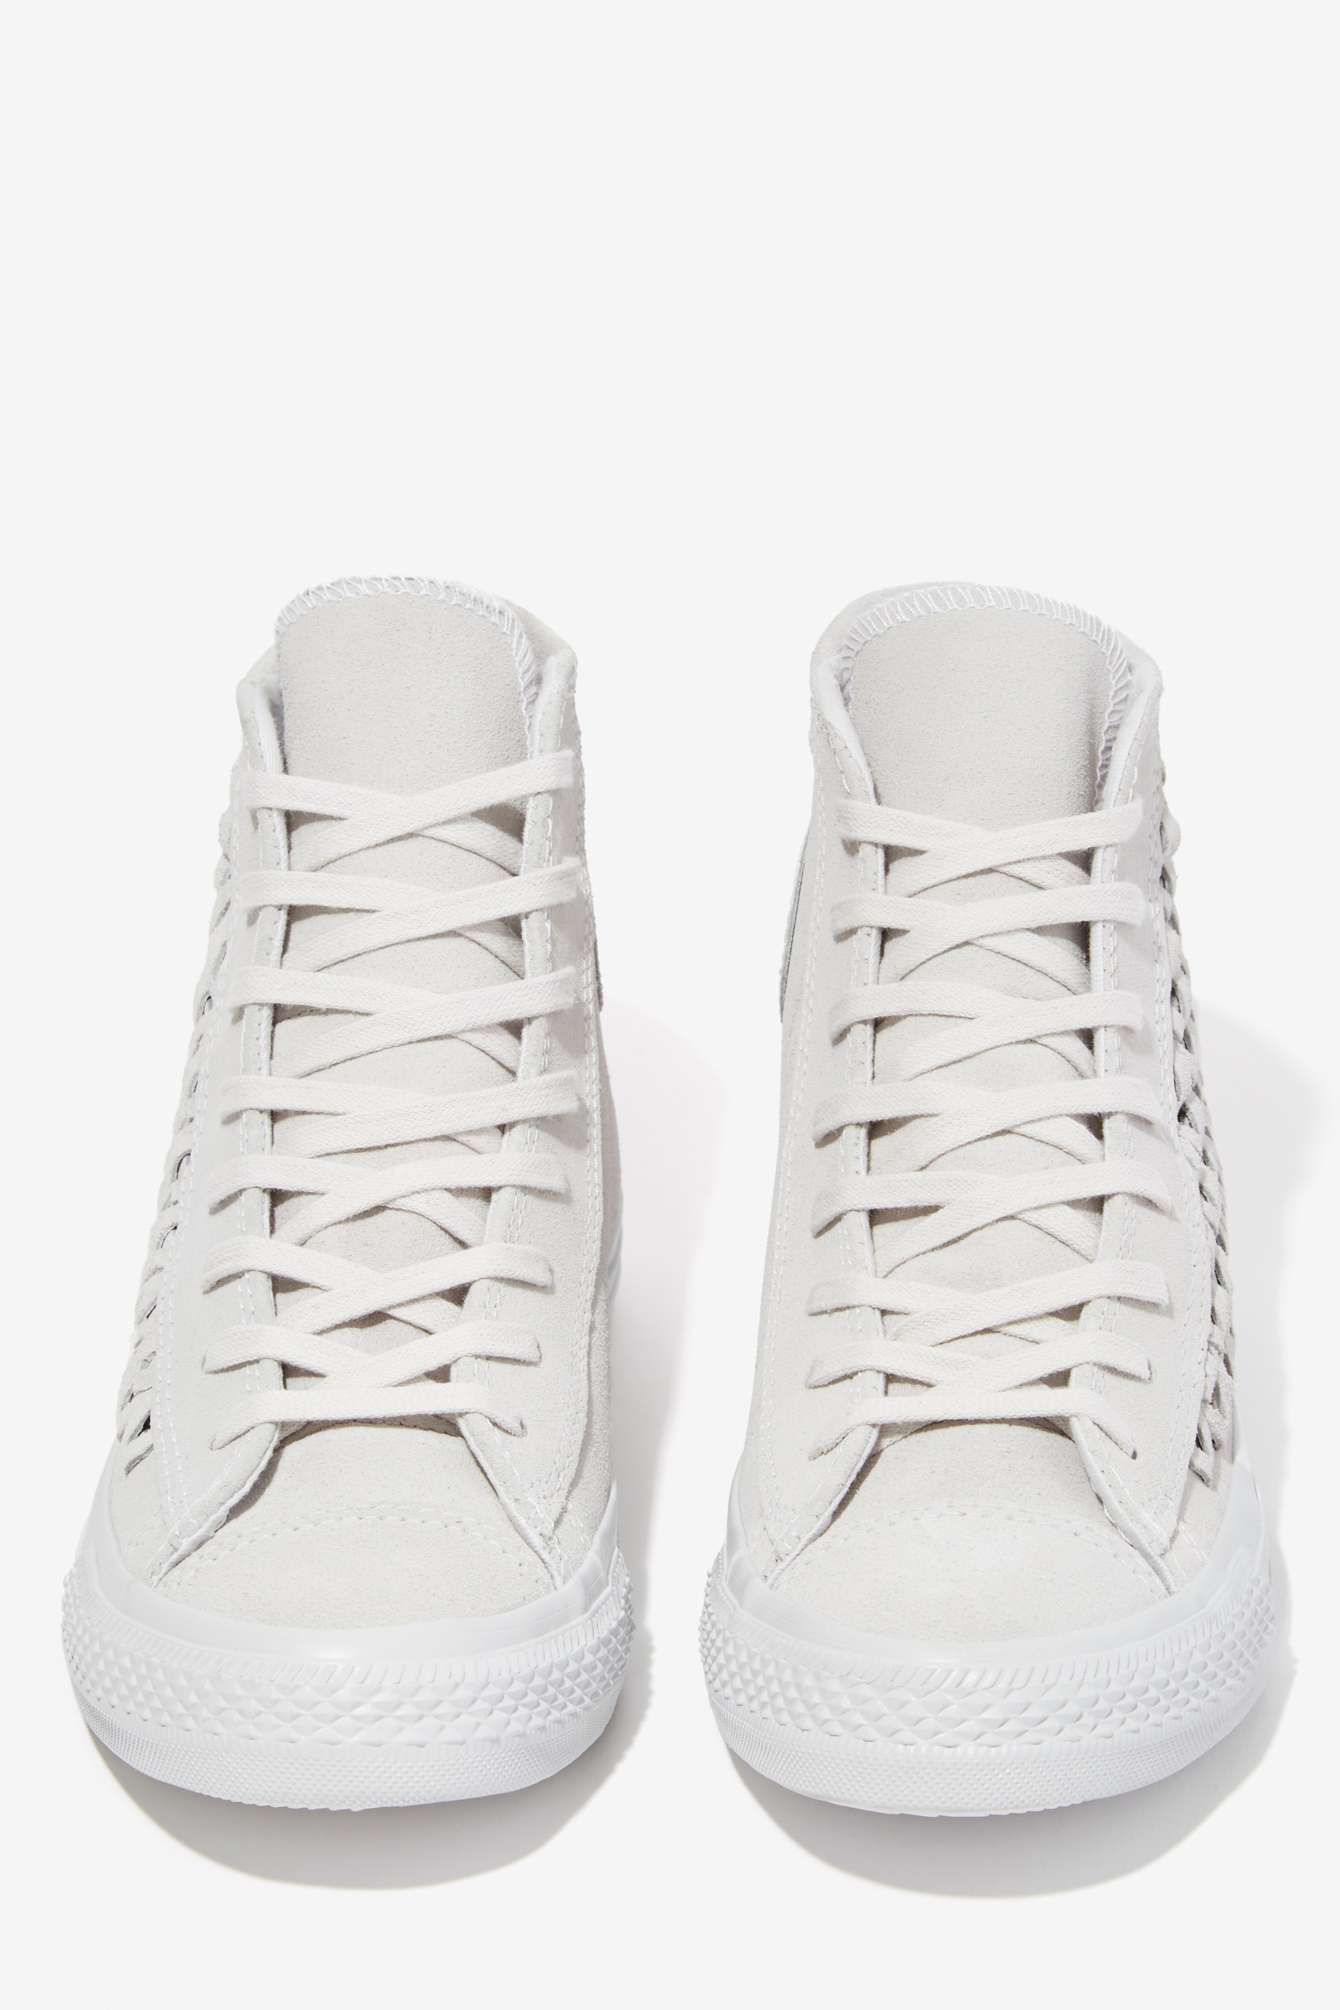 Converse All Star High Top Suede Sneaker Woven Gray